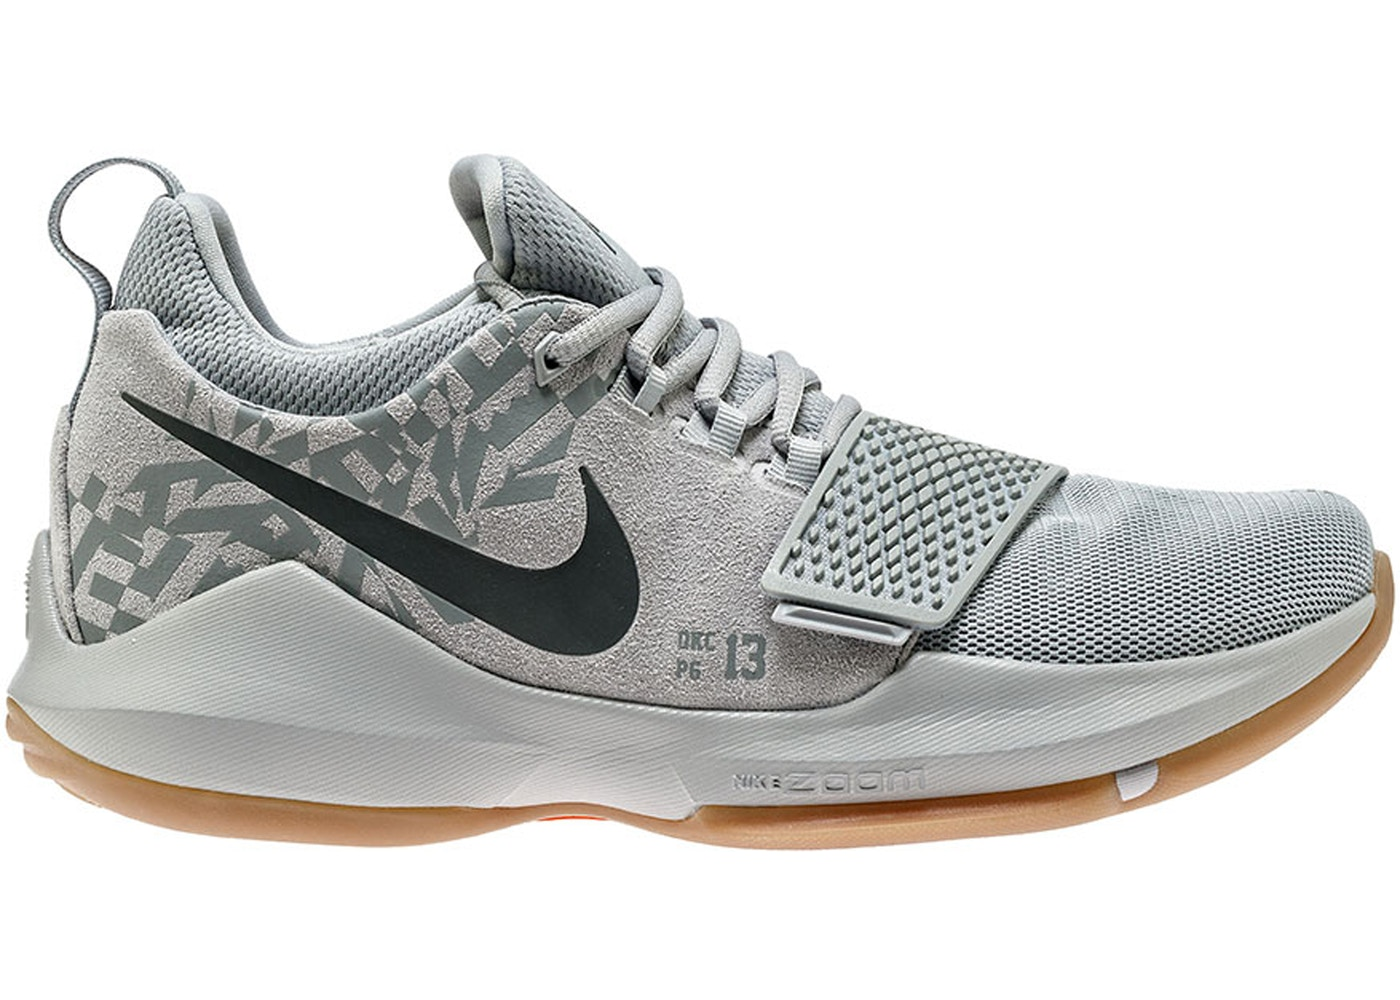 Nike Pg 1 Baseline 878627 009